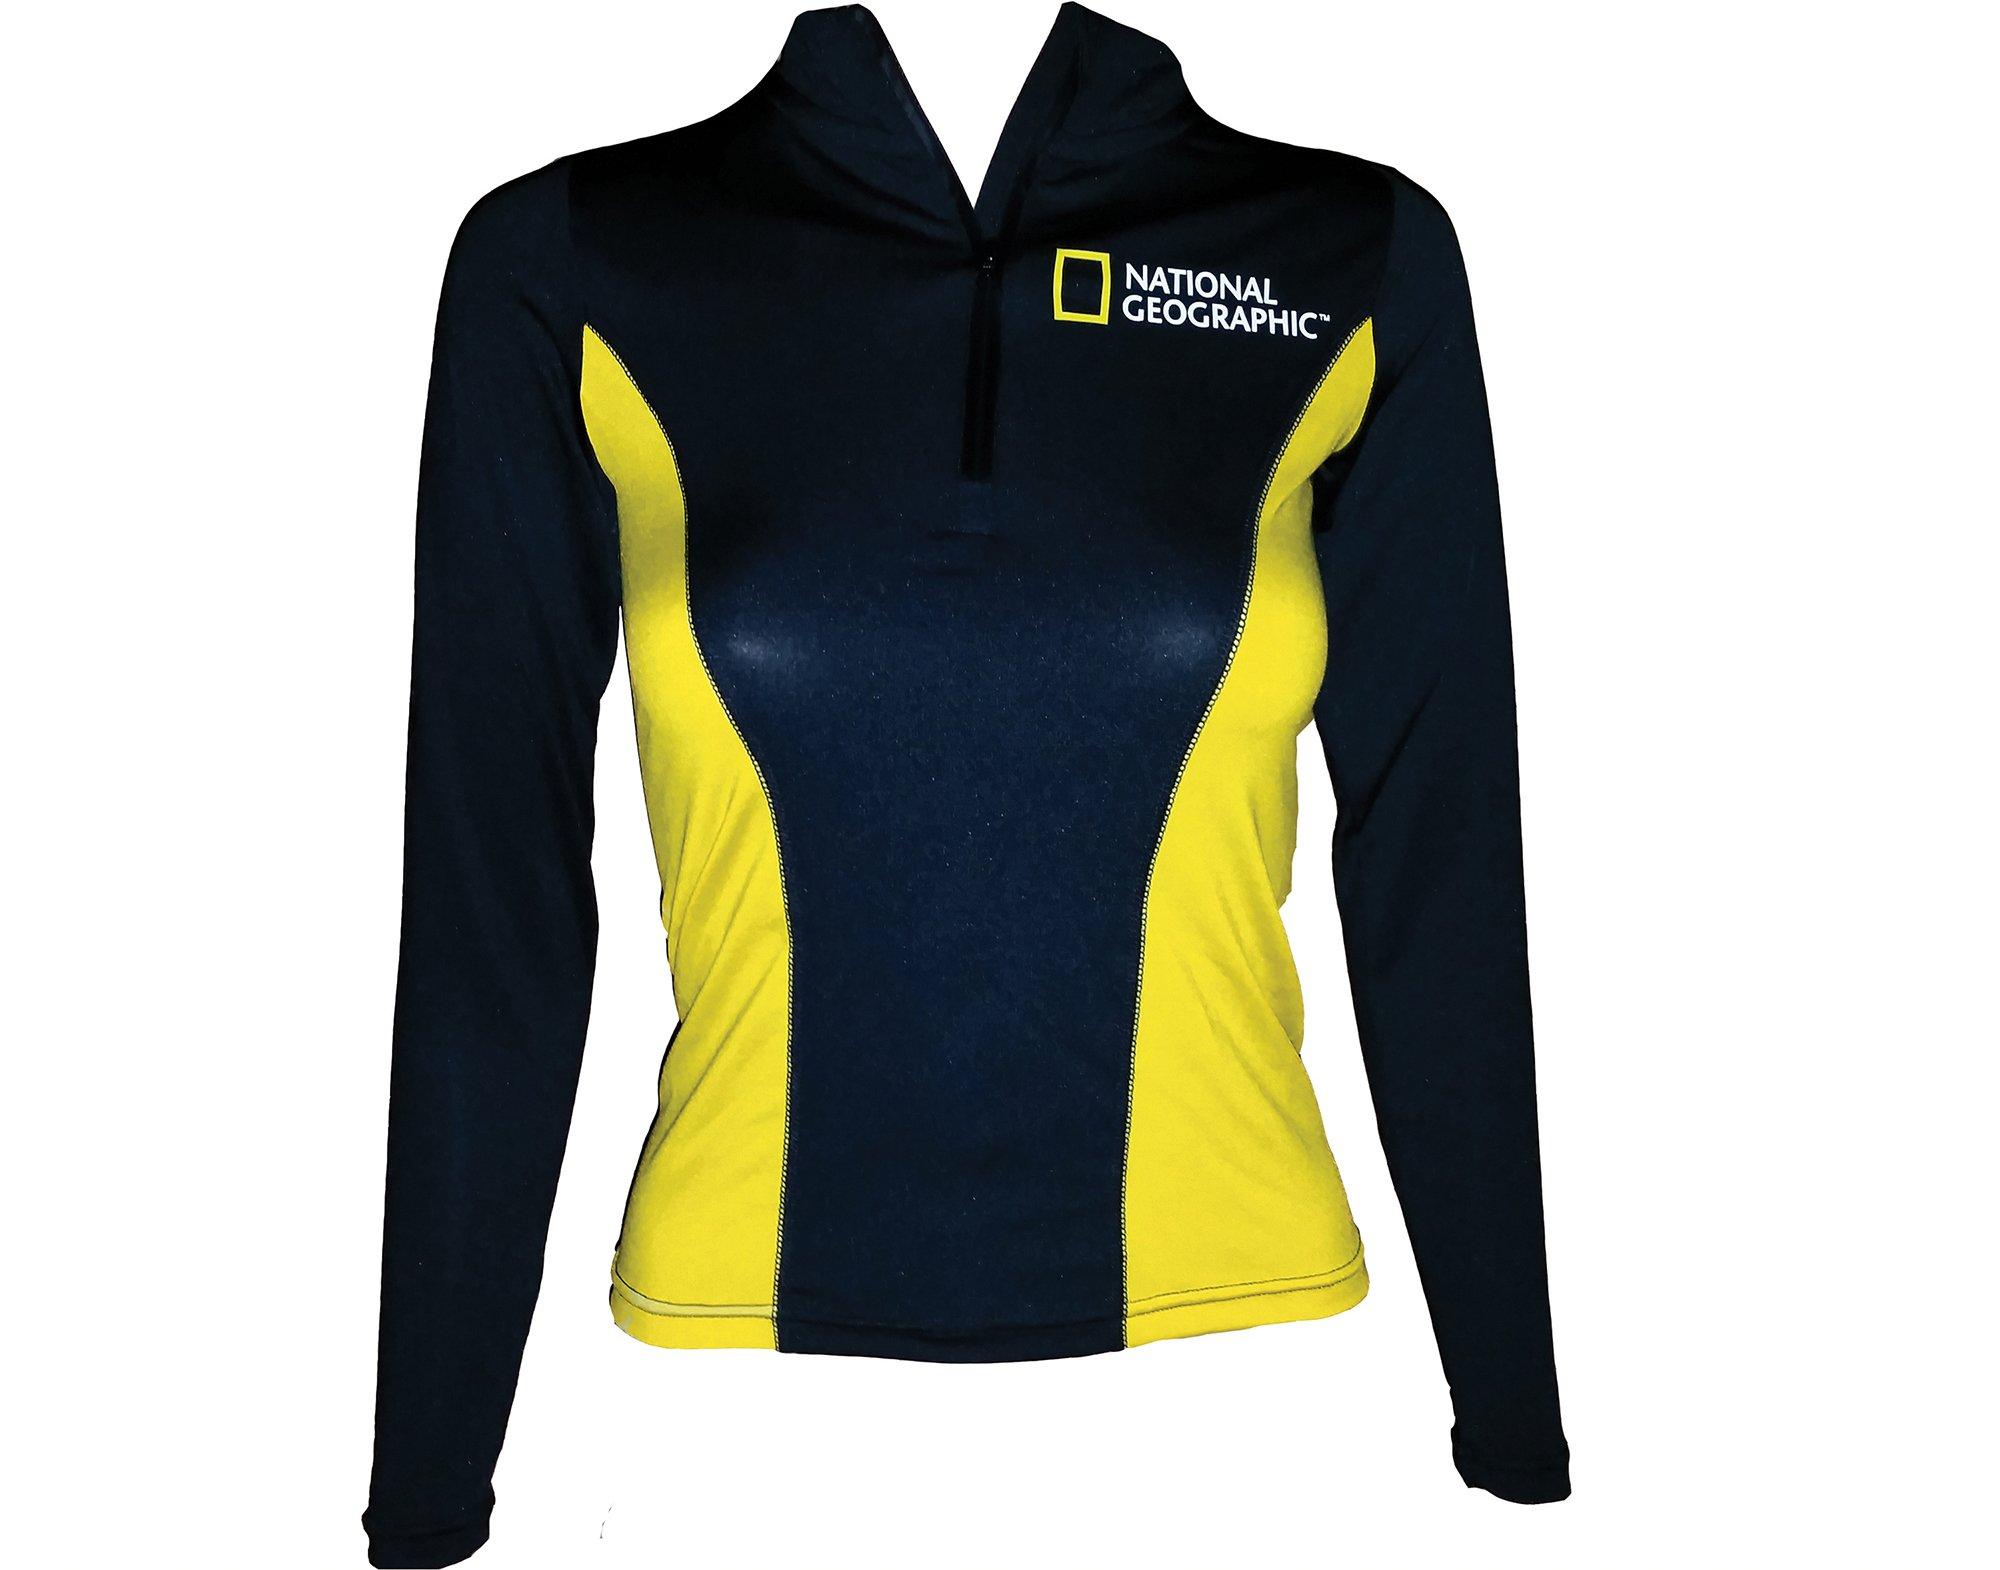 National Geographic Snorkeler 6276 Long sleeve Rash Ladies Classic Black/Yellow Small, Black